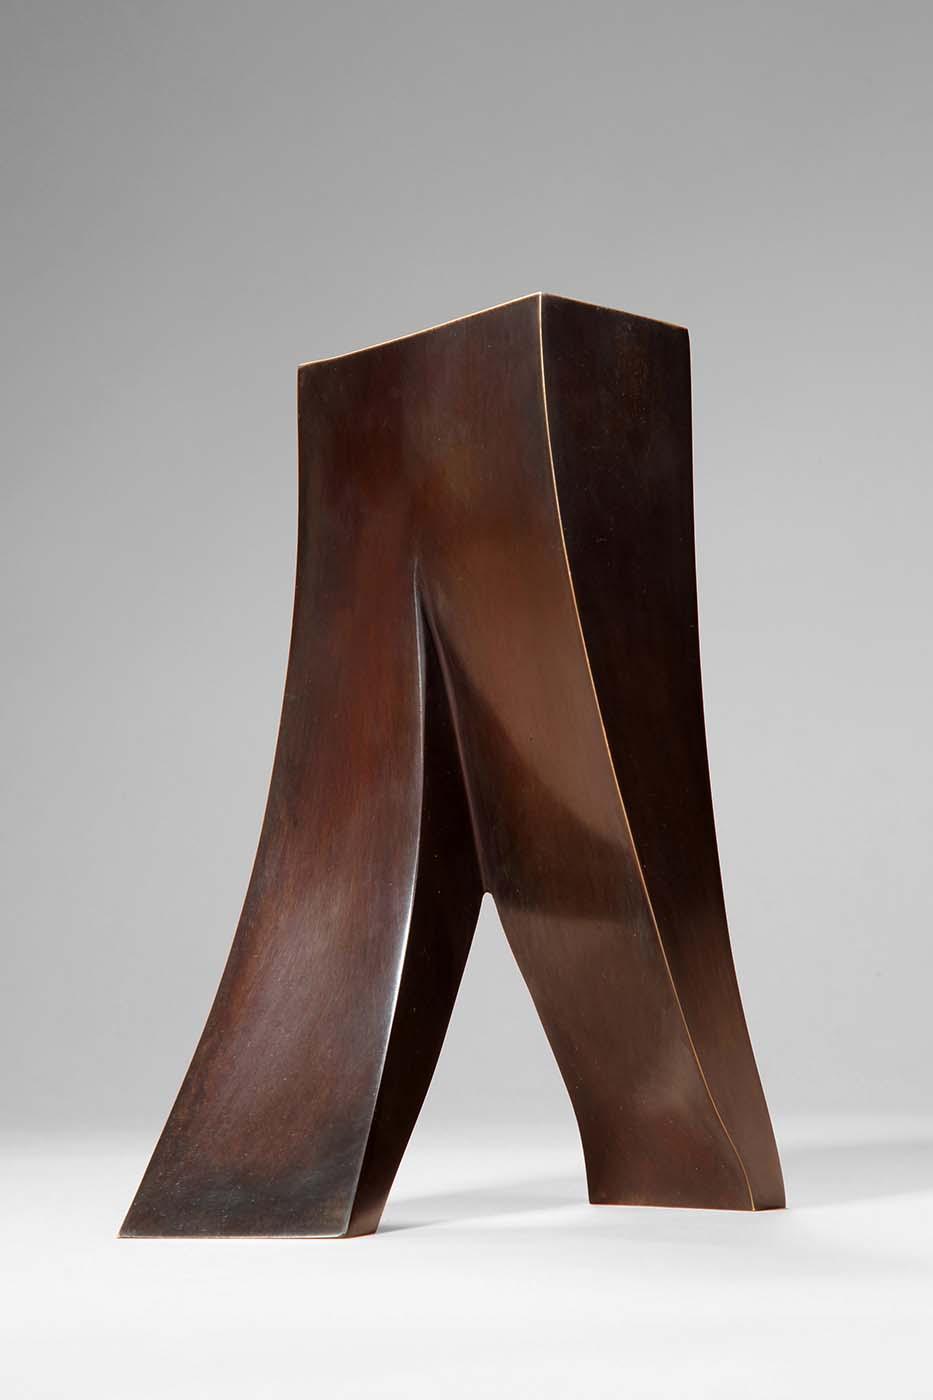 Schritt zum Erfolg, 2011, Bronze, 18,5 x 16 x 9 cm (01)